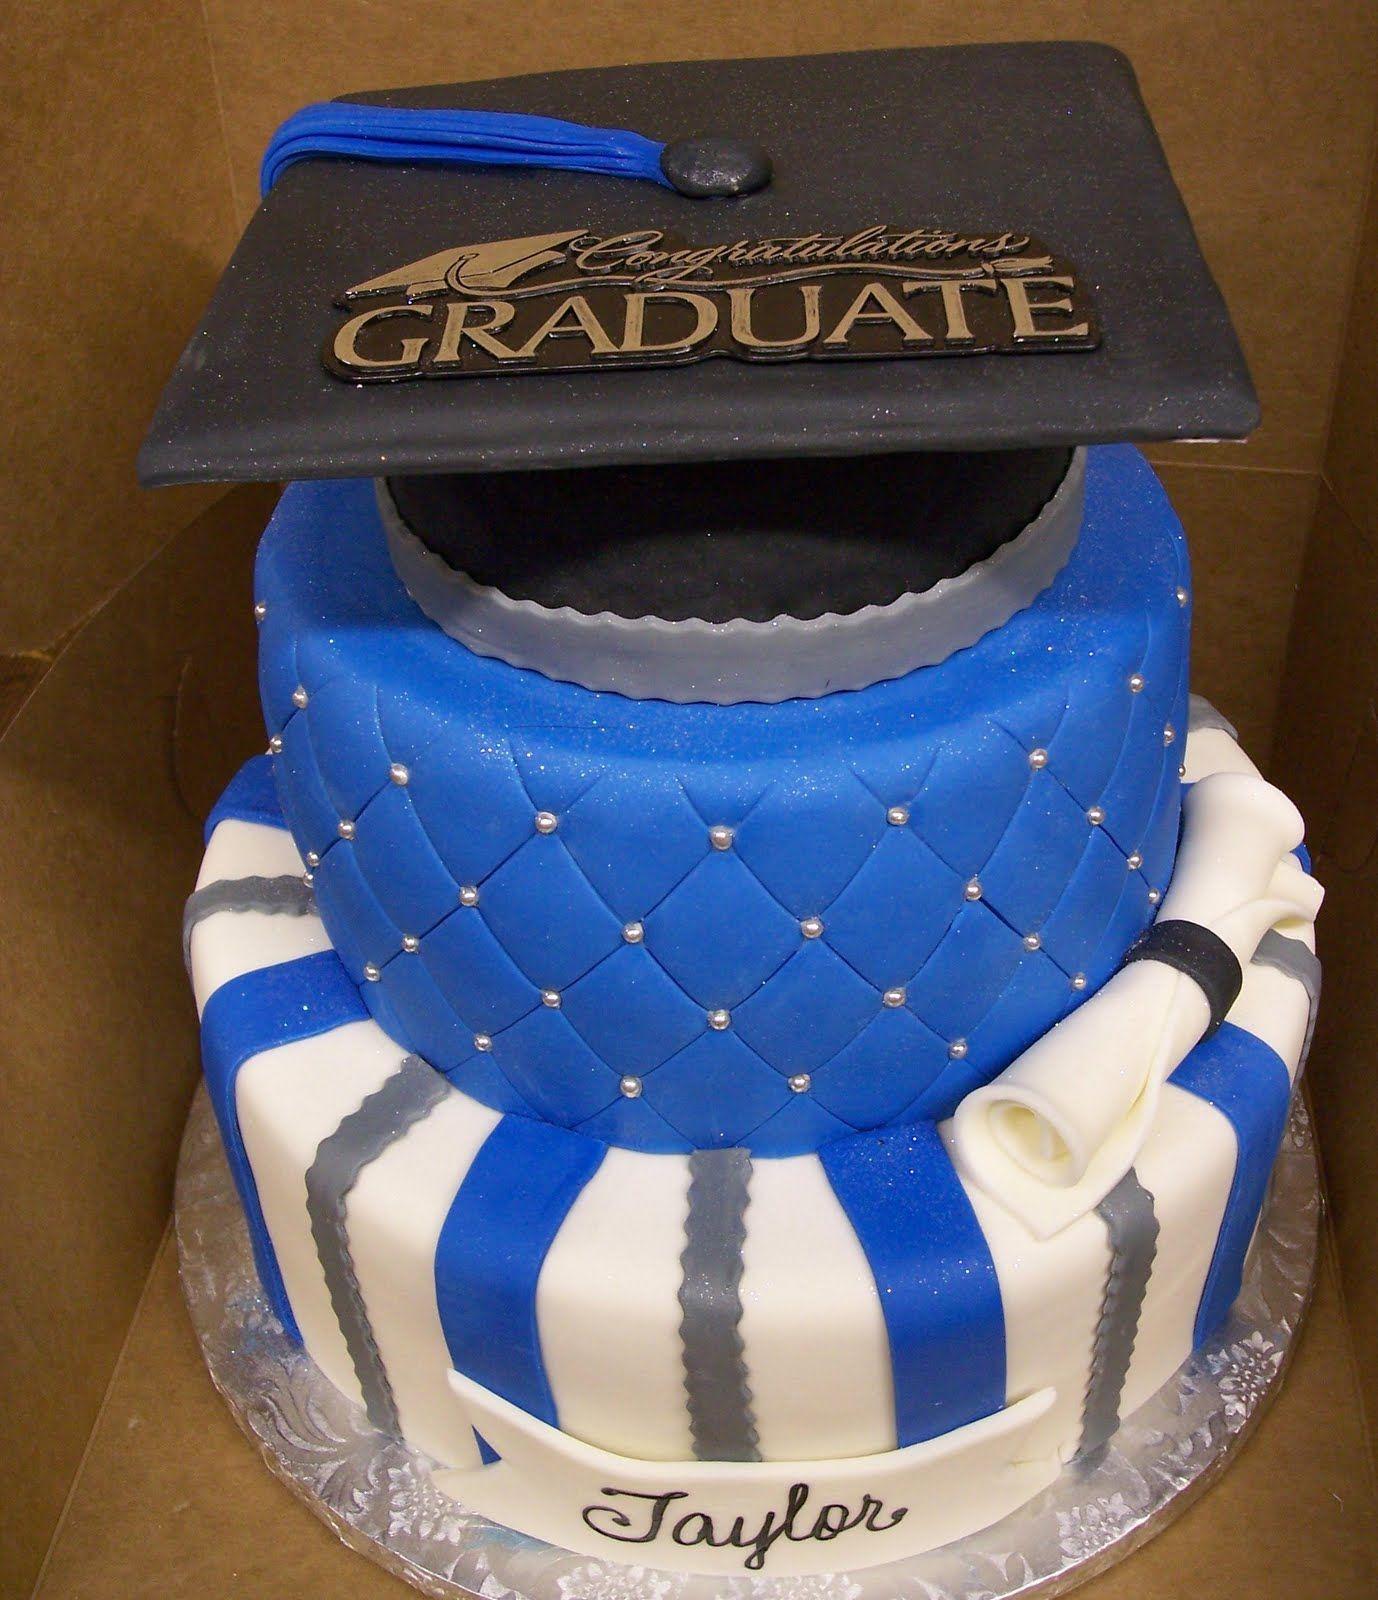 graduation cake decorations near me